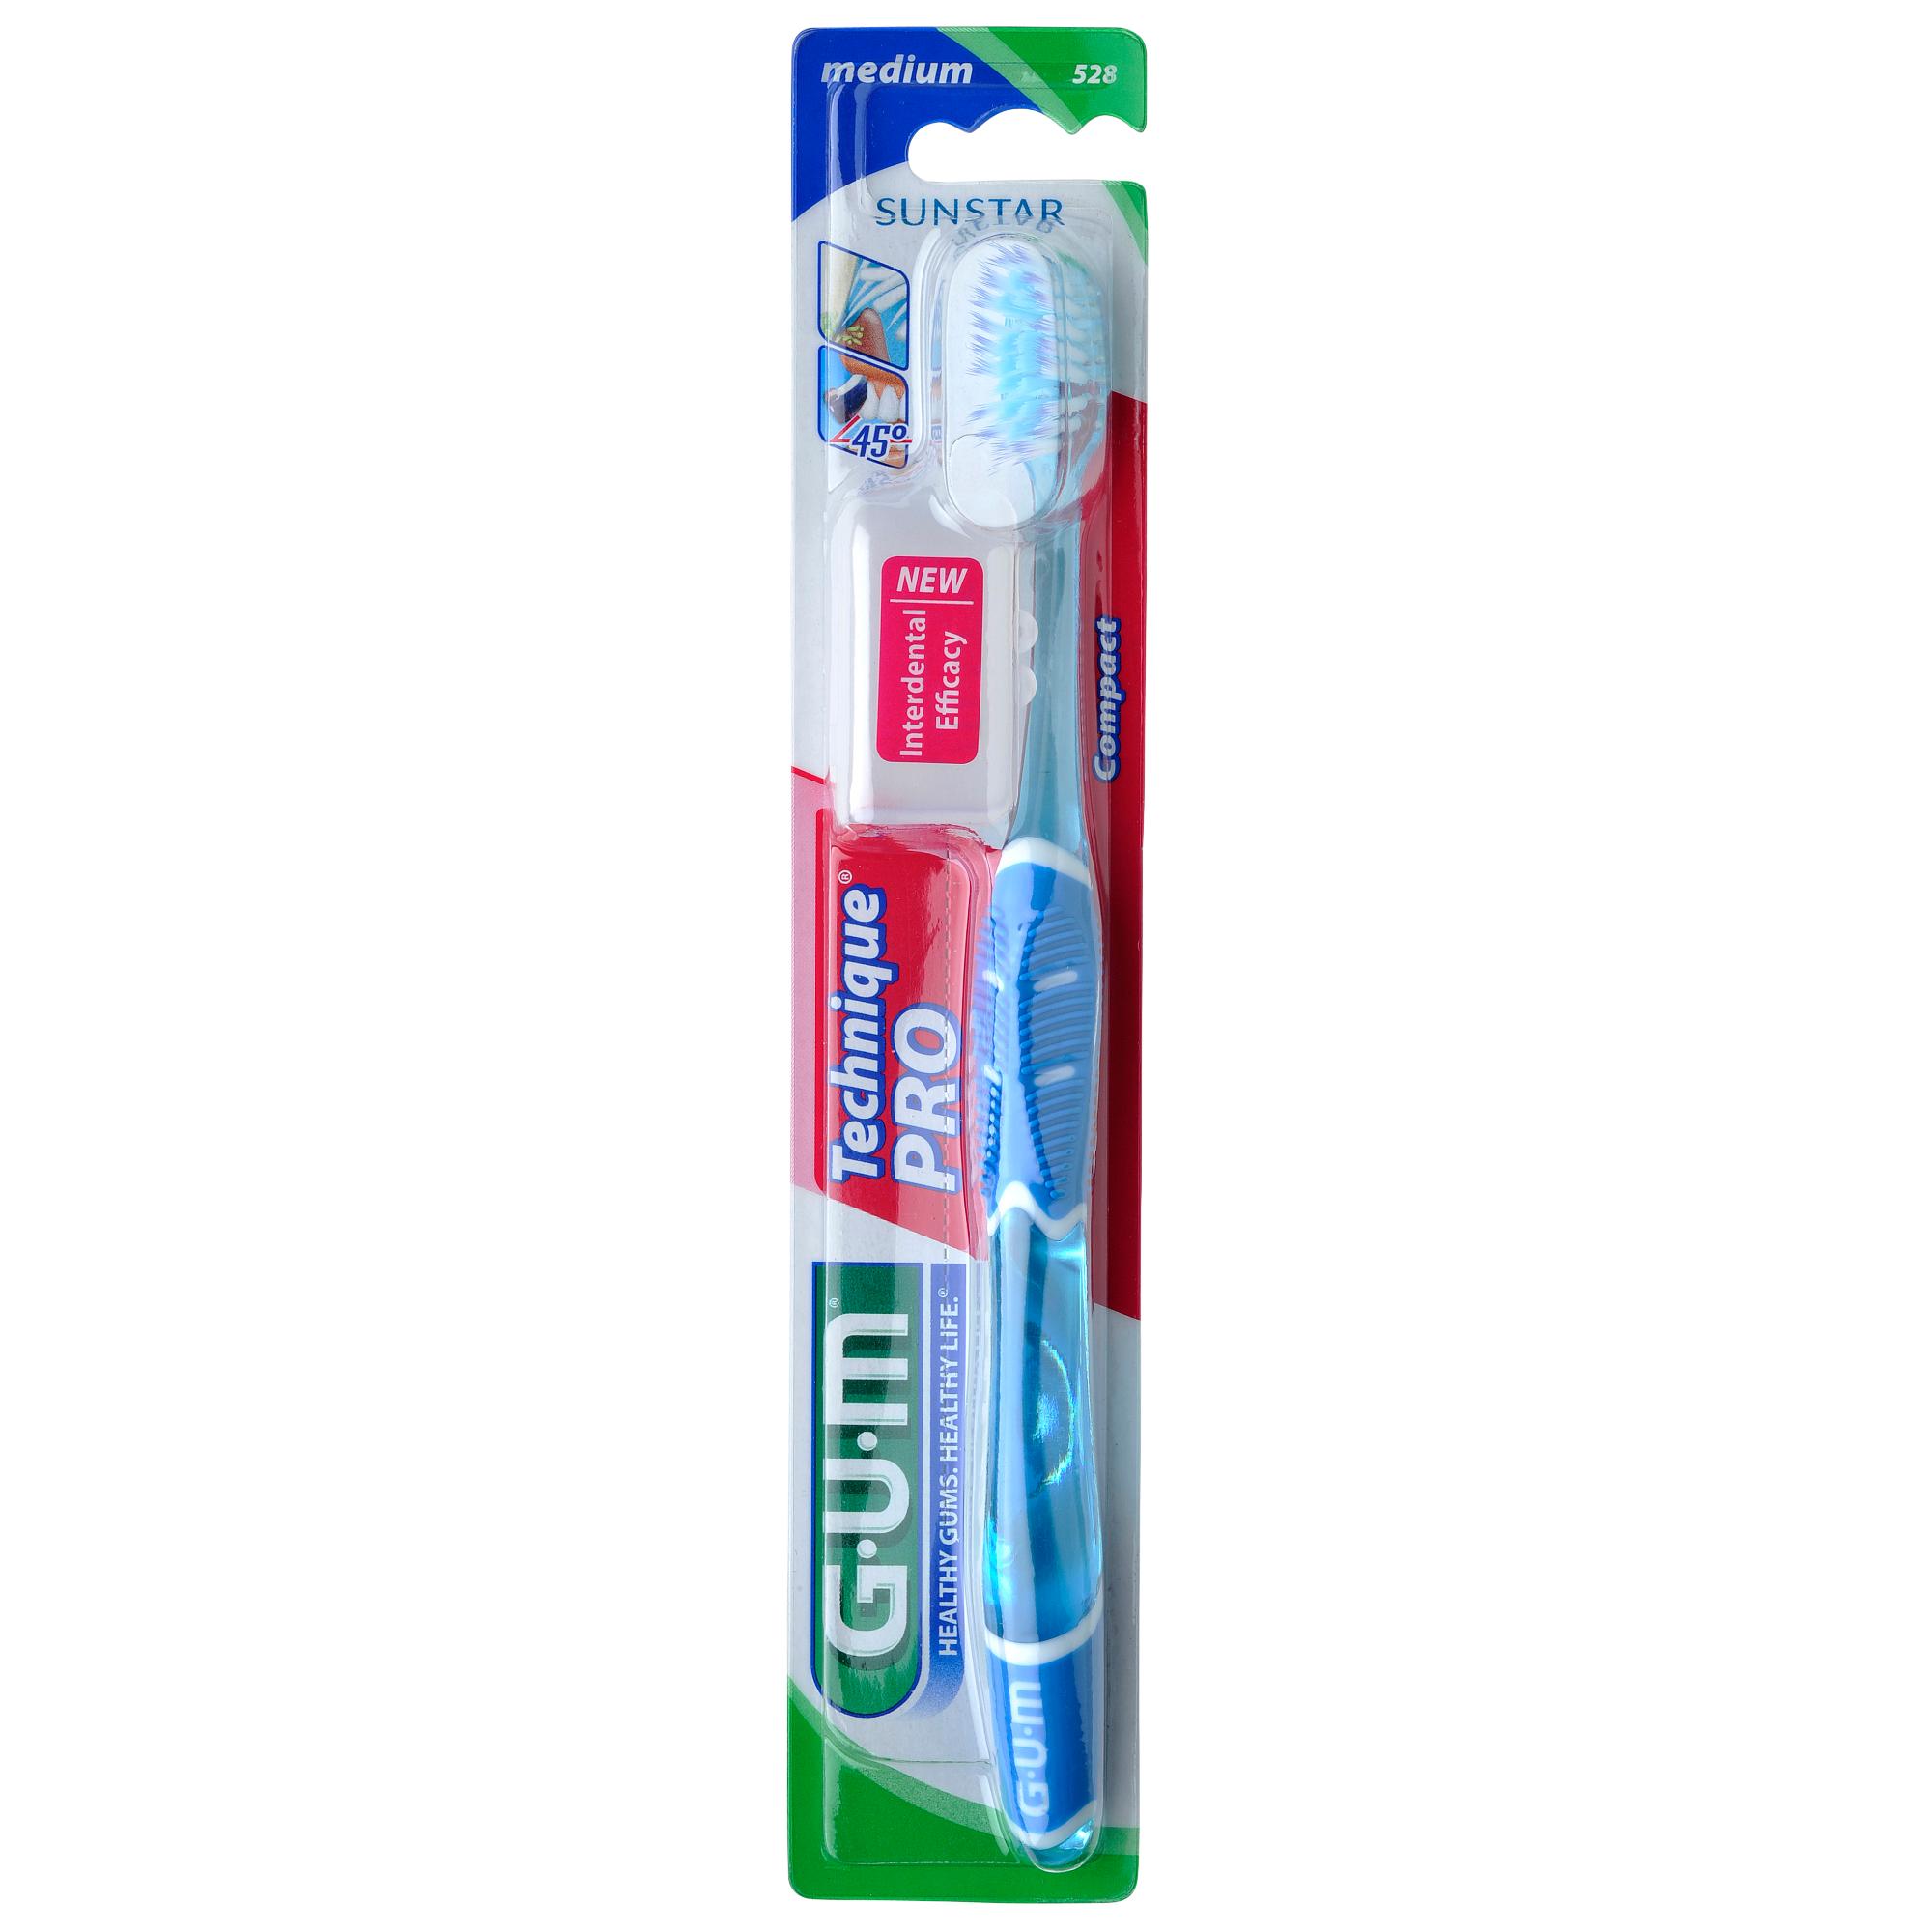 Gum Technique PRO Compact Medium Οδοντόβουρτσα με Θήκη Προστασίας (528) – μπλέ